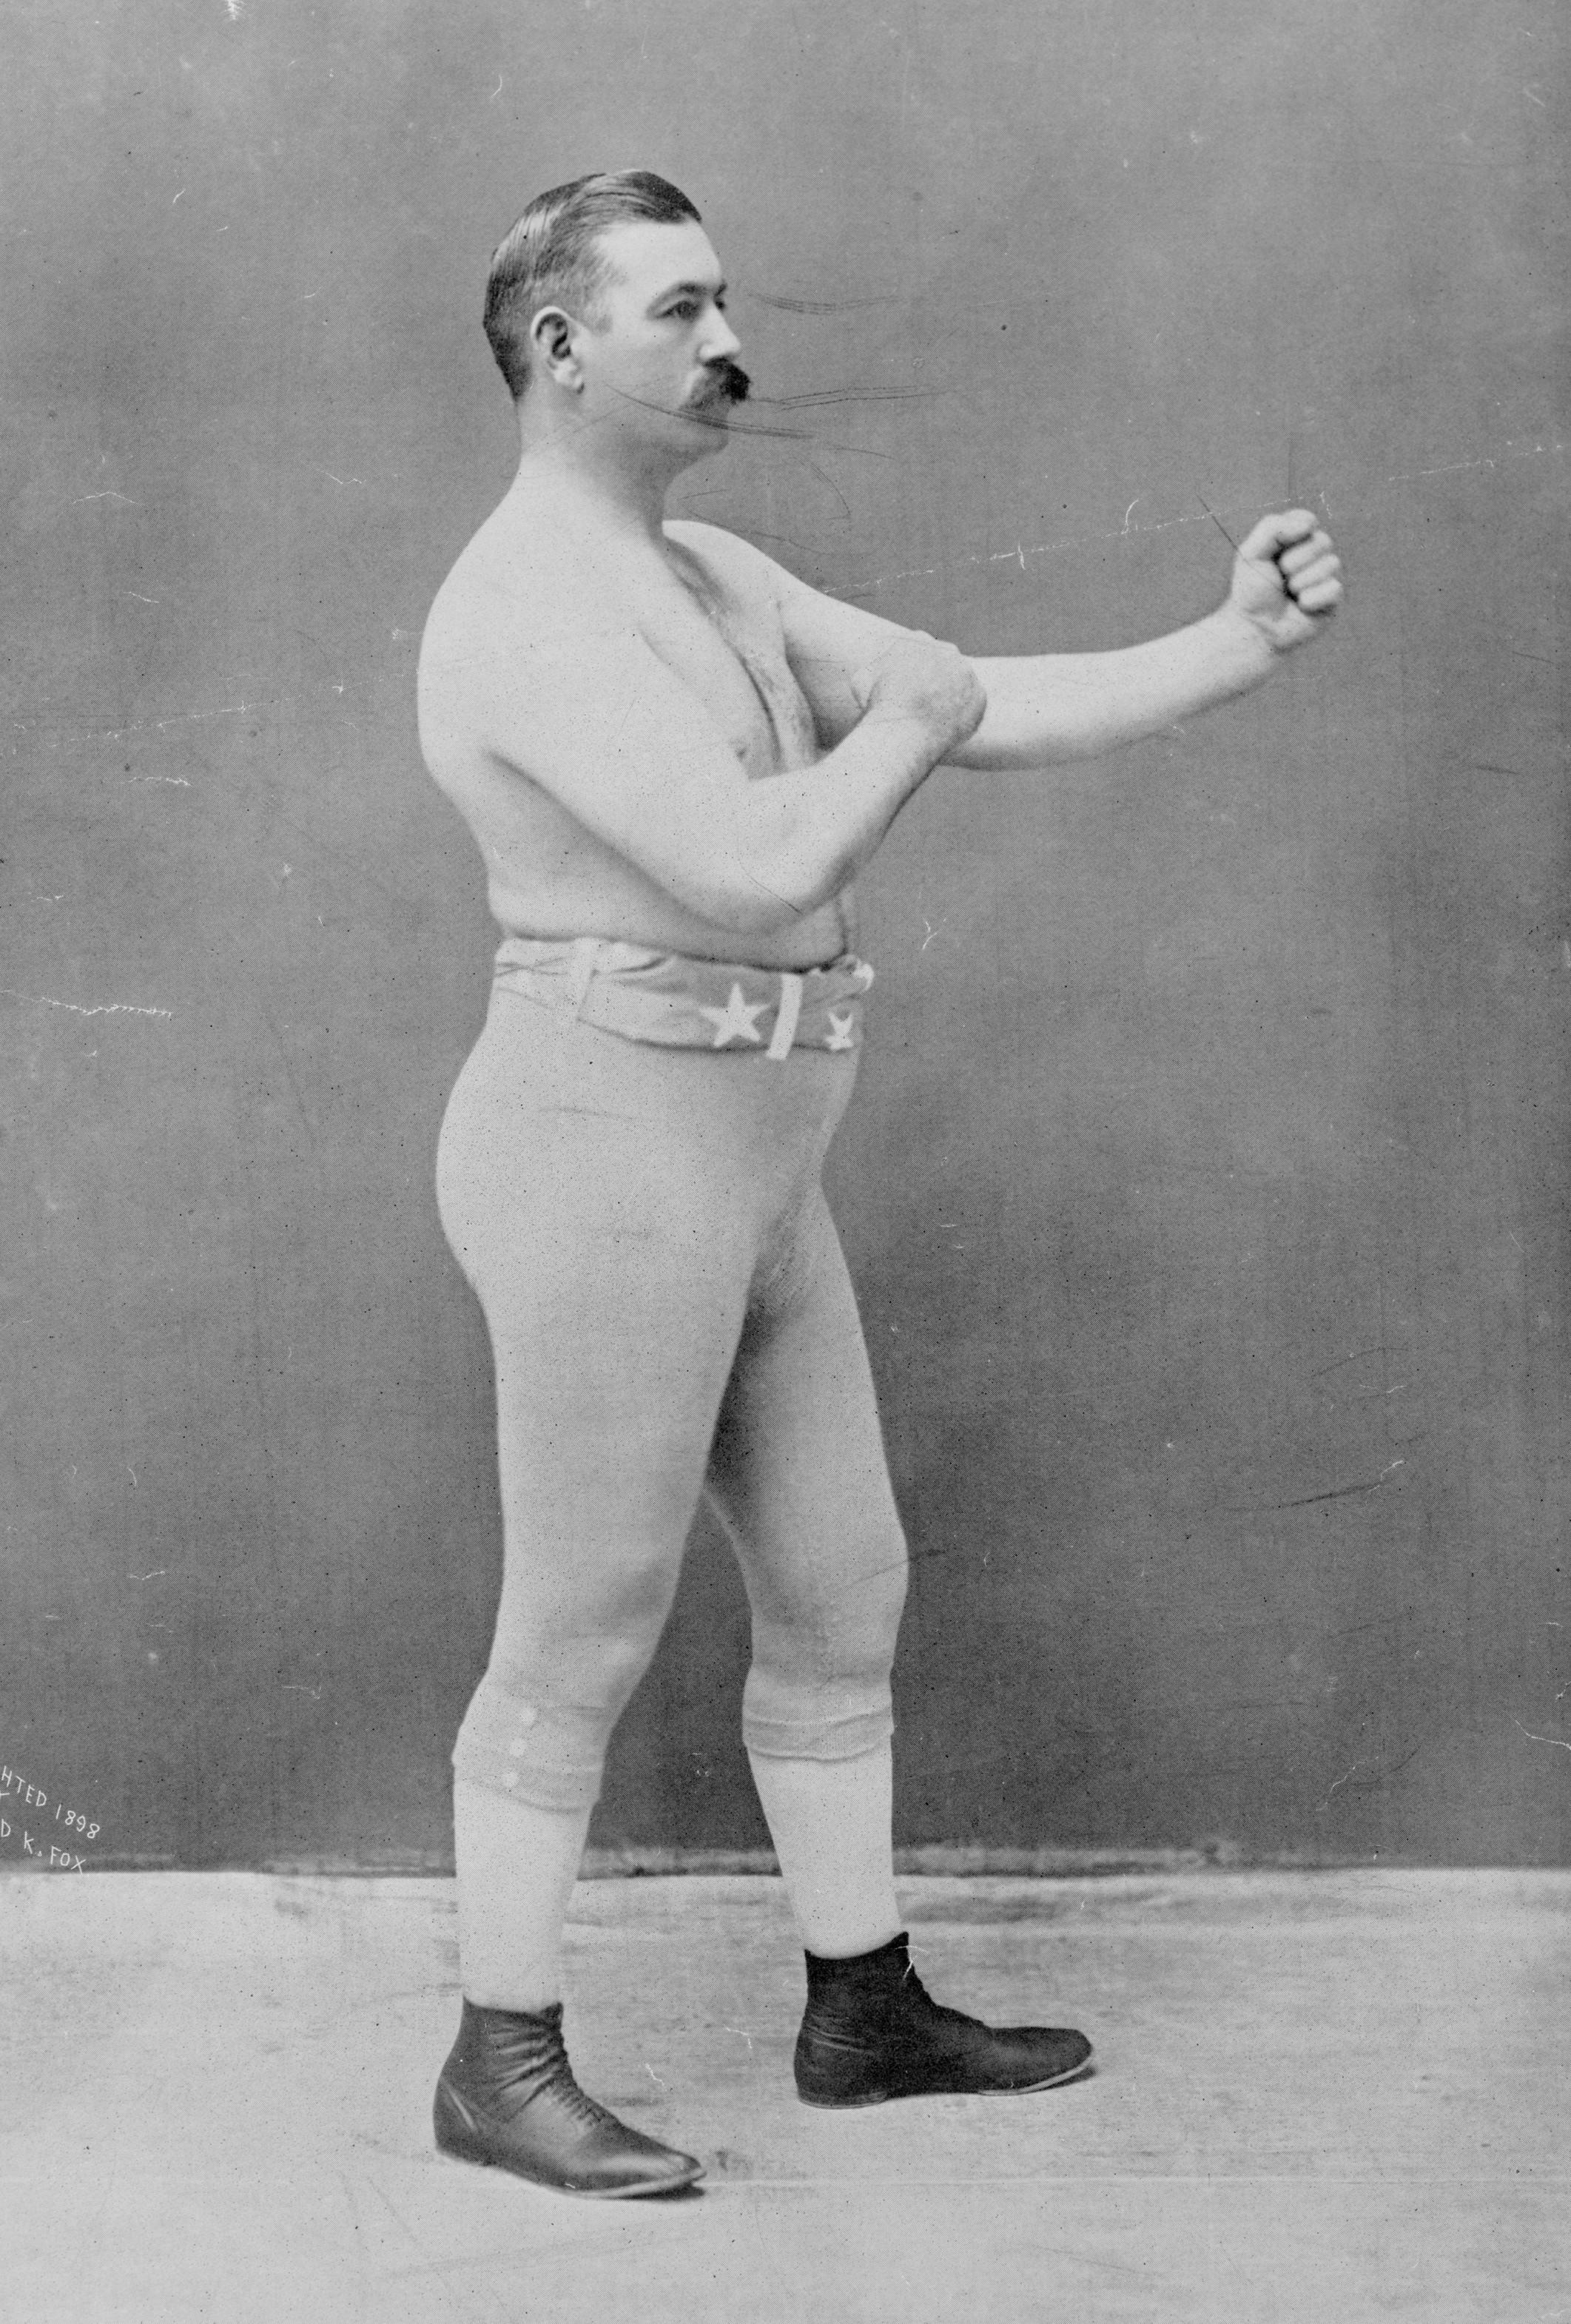 John_L._Sullivan_1898.jpg